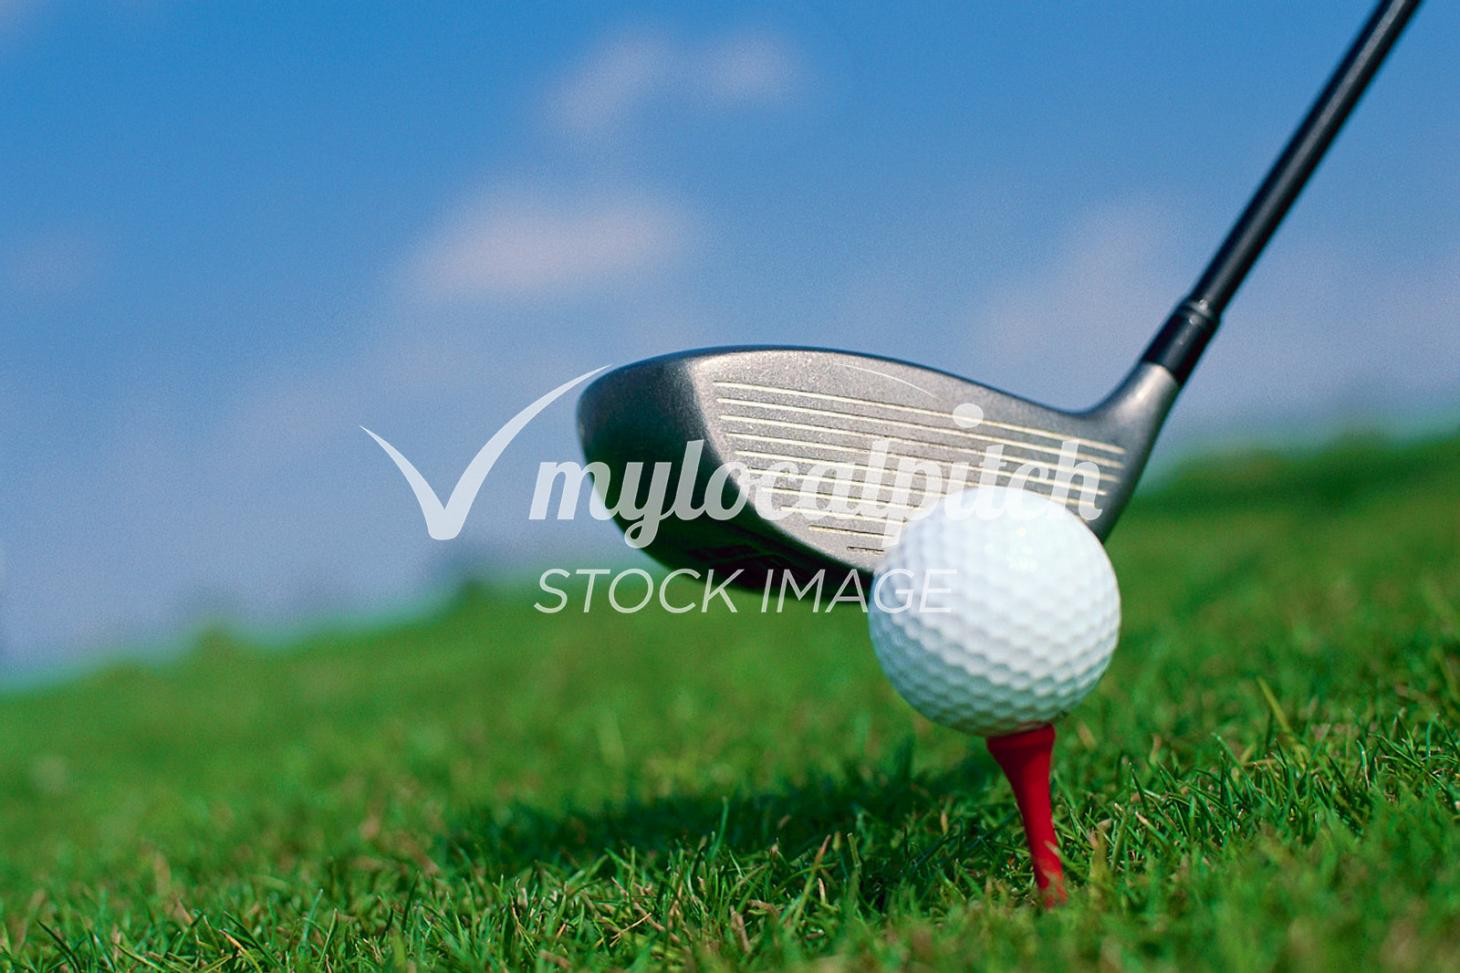 Coulsdon Court Golf Club 18 hole golf course